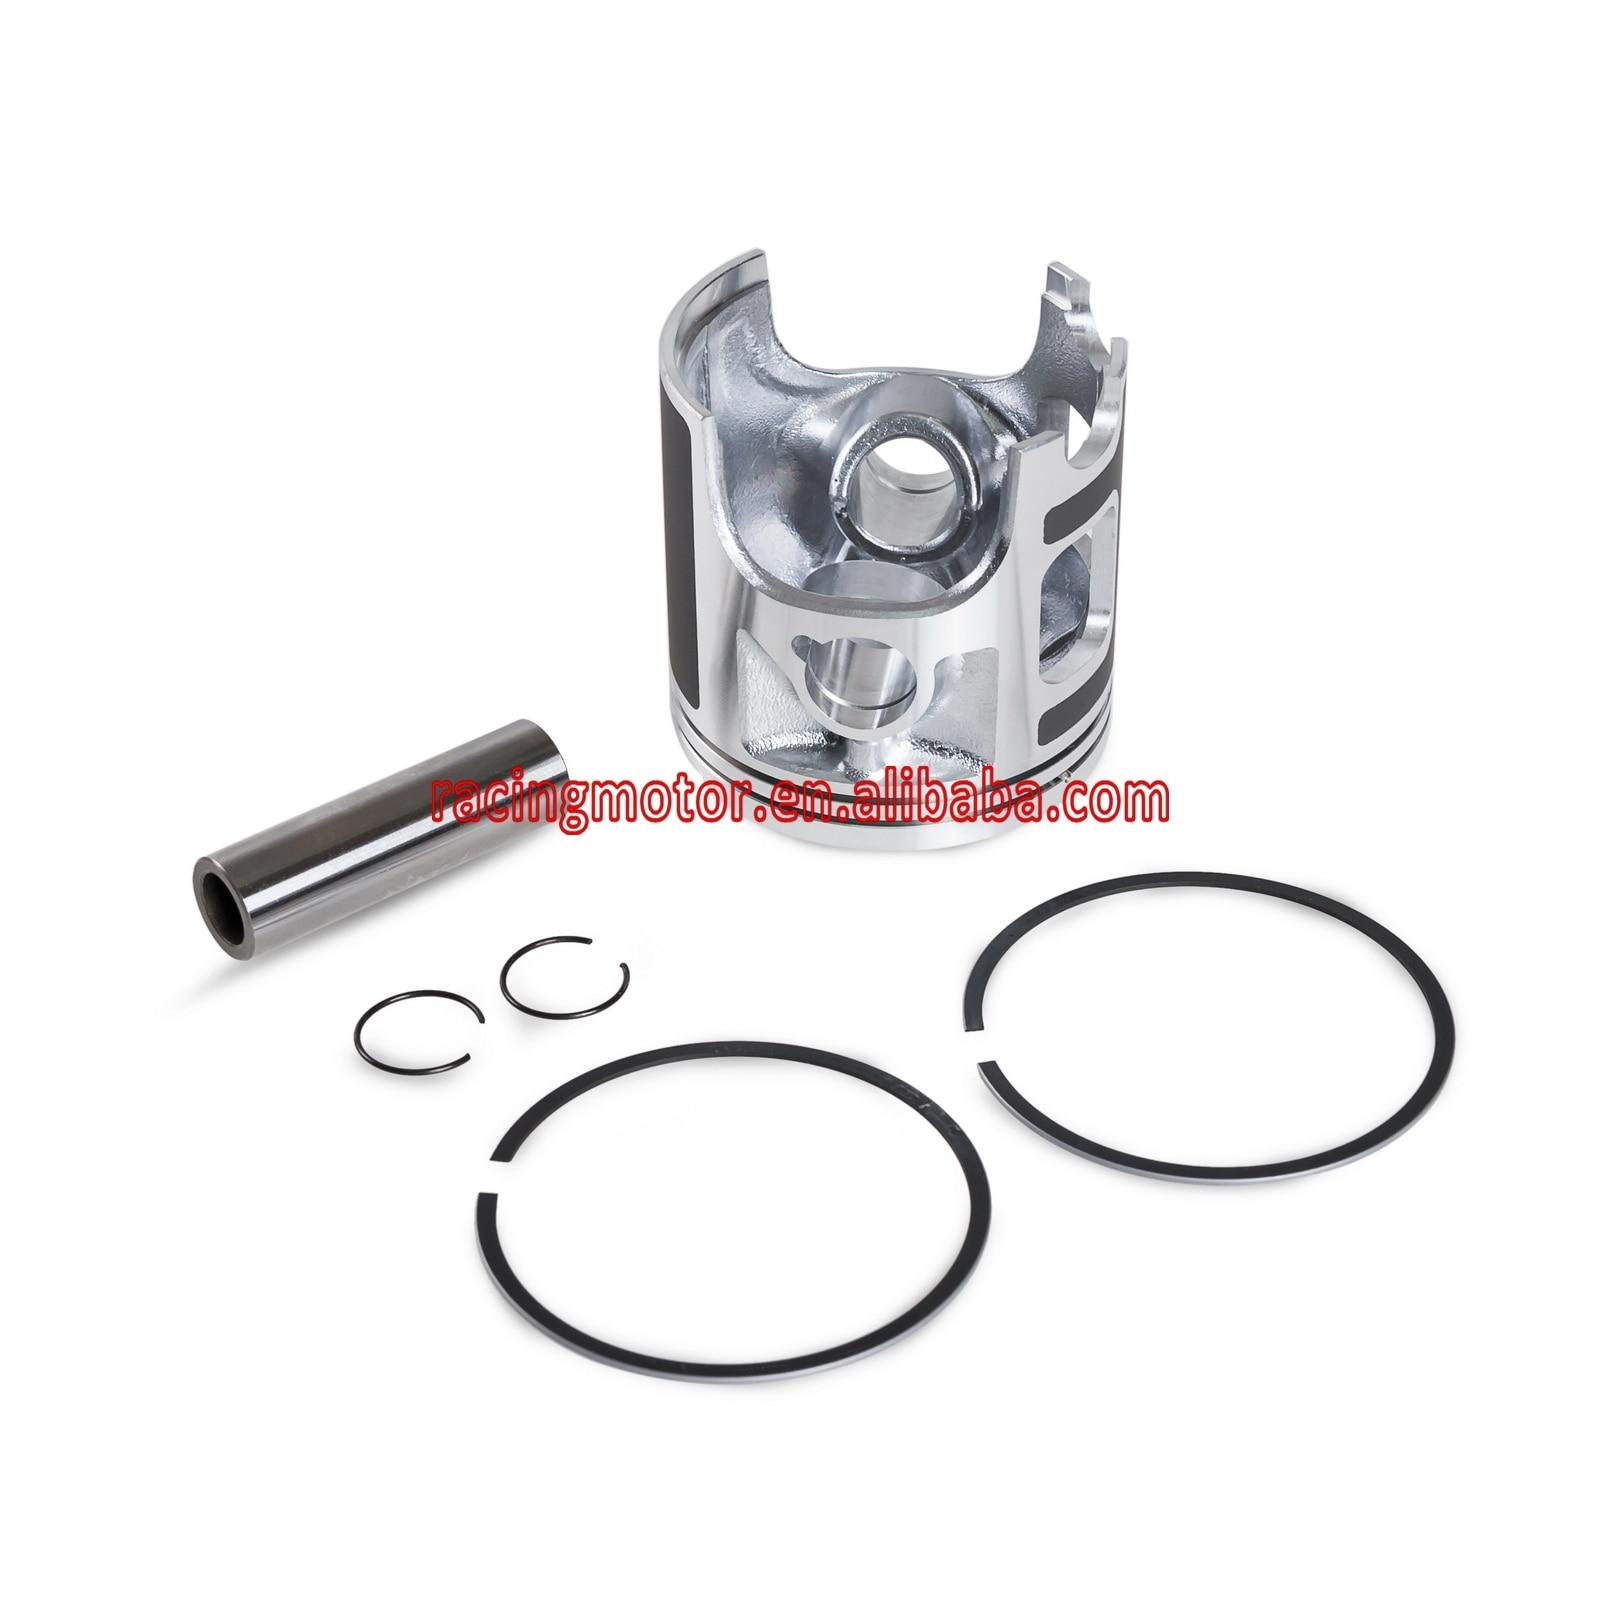 66mm 66.5mm 67mm 67.5mm 68 mm Bore Piston Kit For Yamaha Blaster 200 YFS200 1988-2006 Yamaha Blaster 200